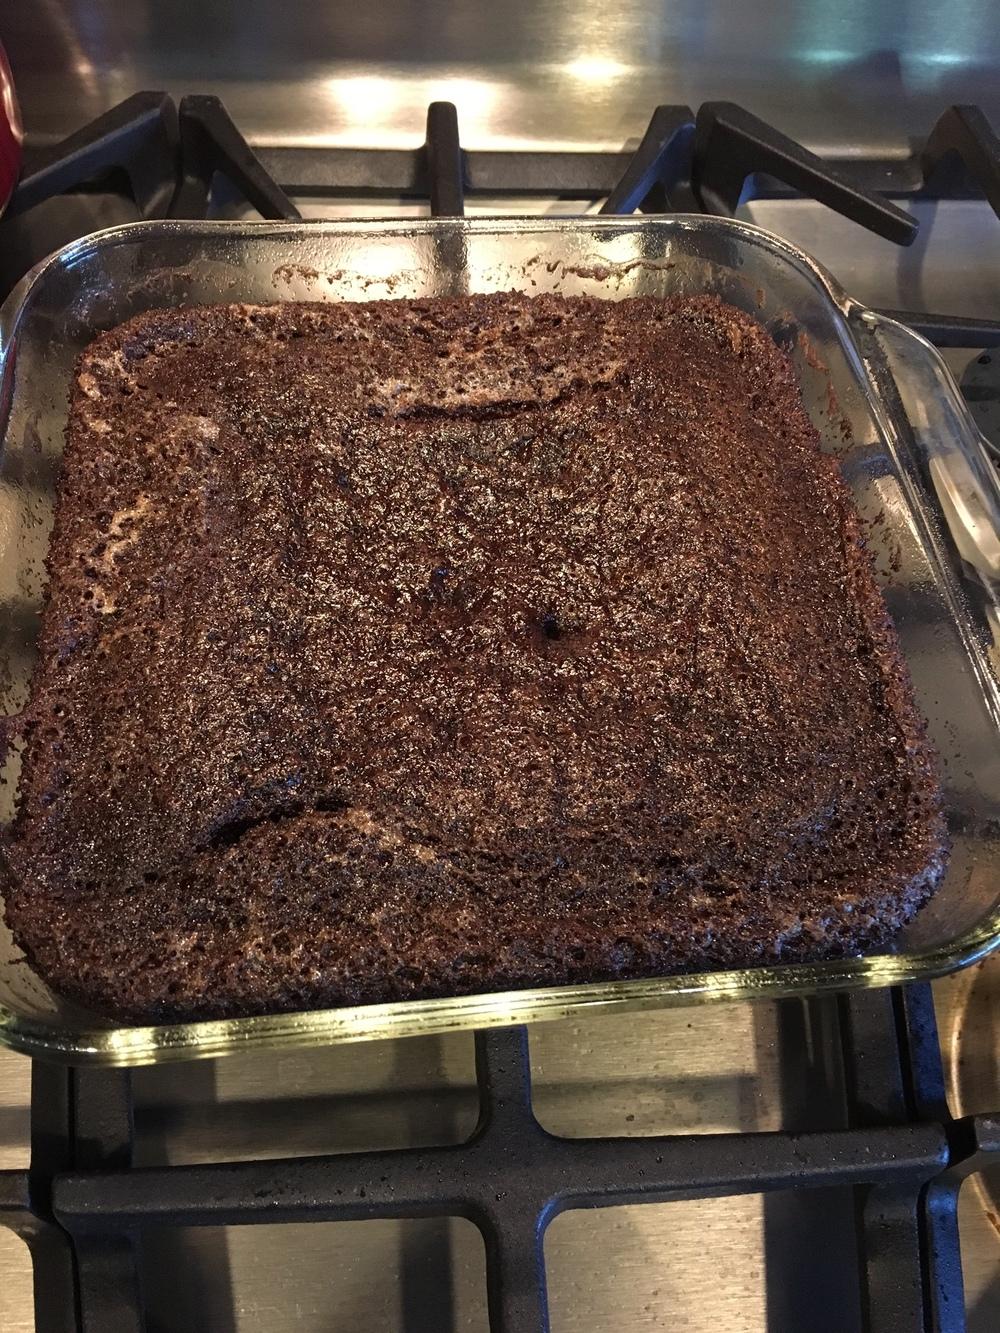 Chocolate wacky cake - Dairy-free, egg-free, soy-free, nut-free, peanut-free